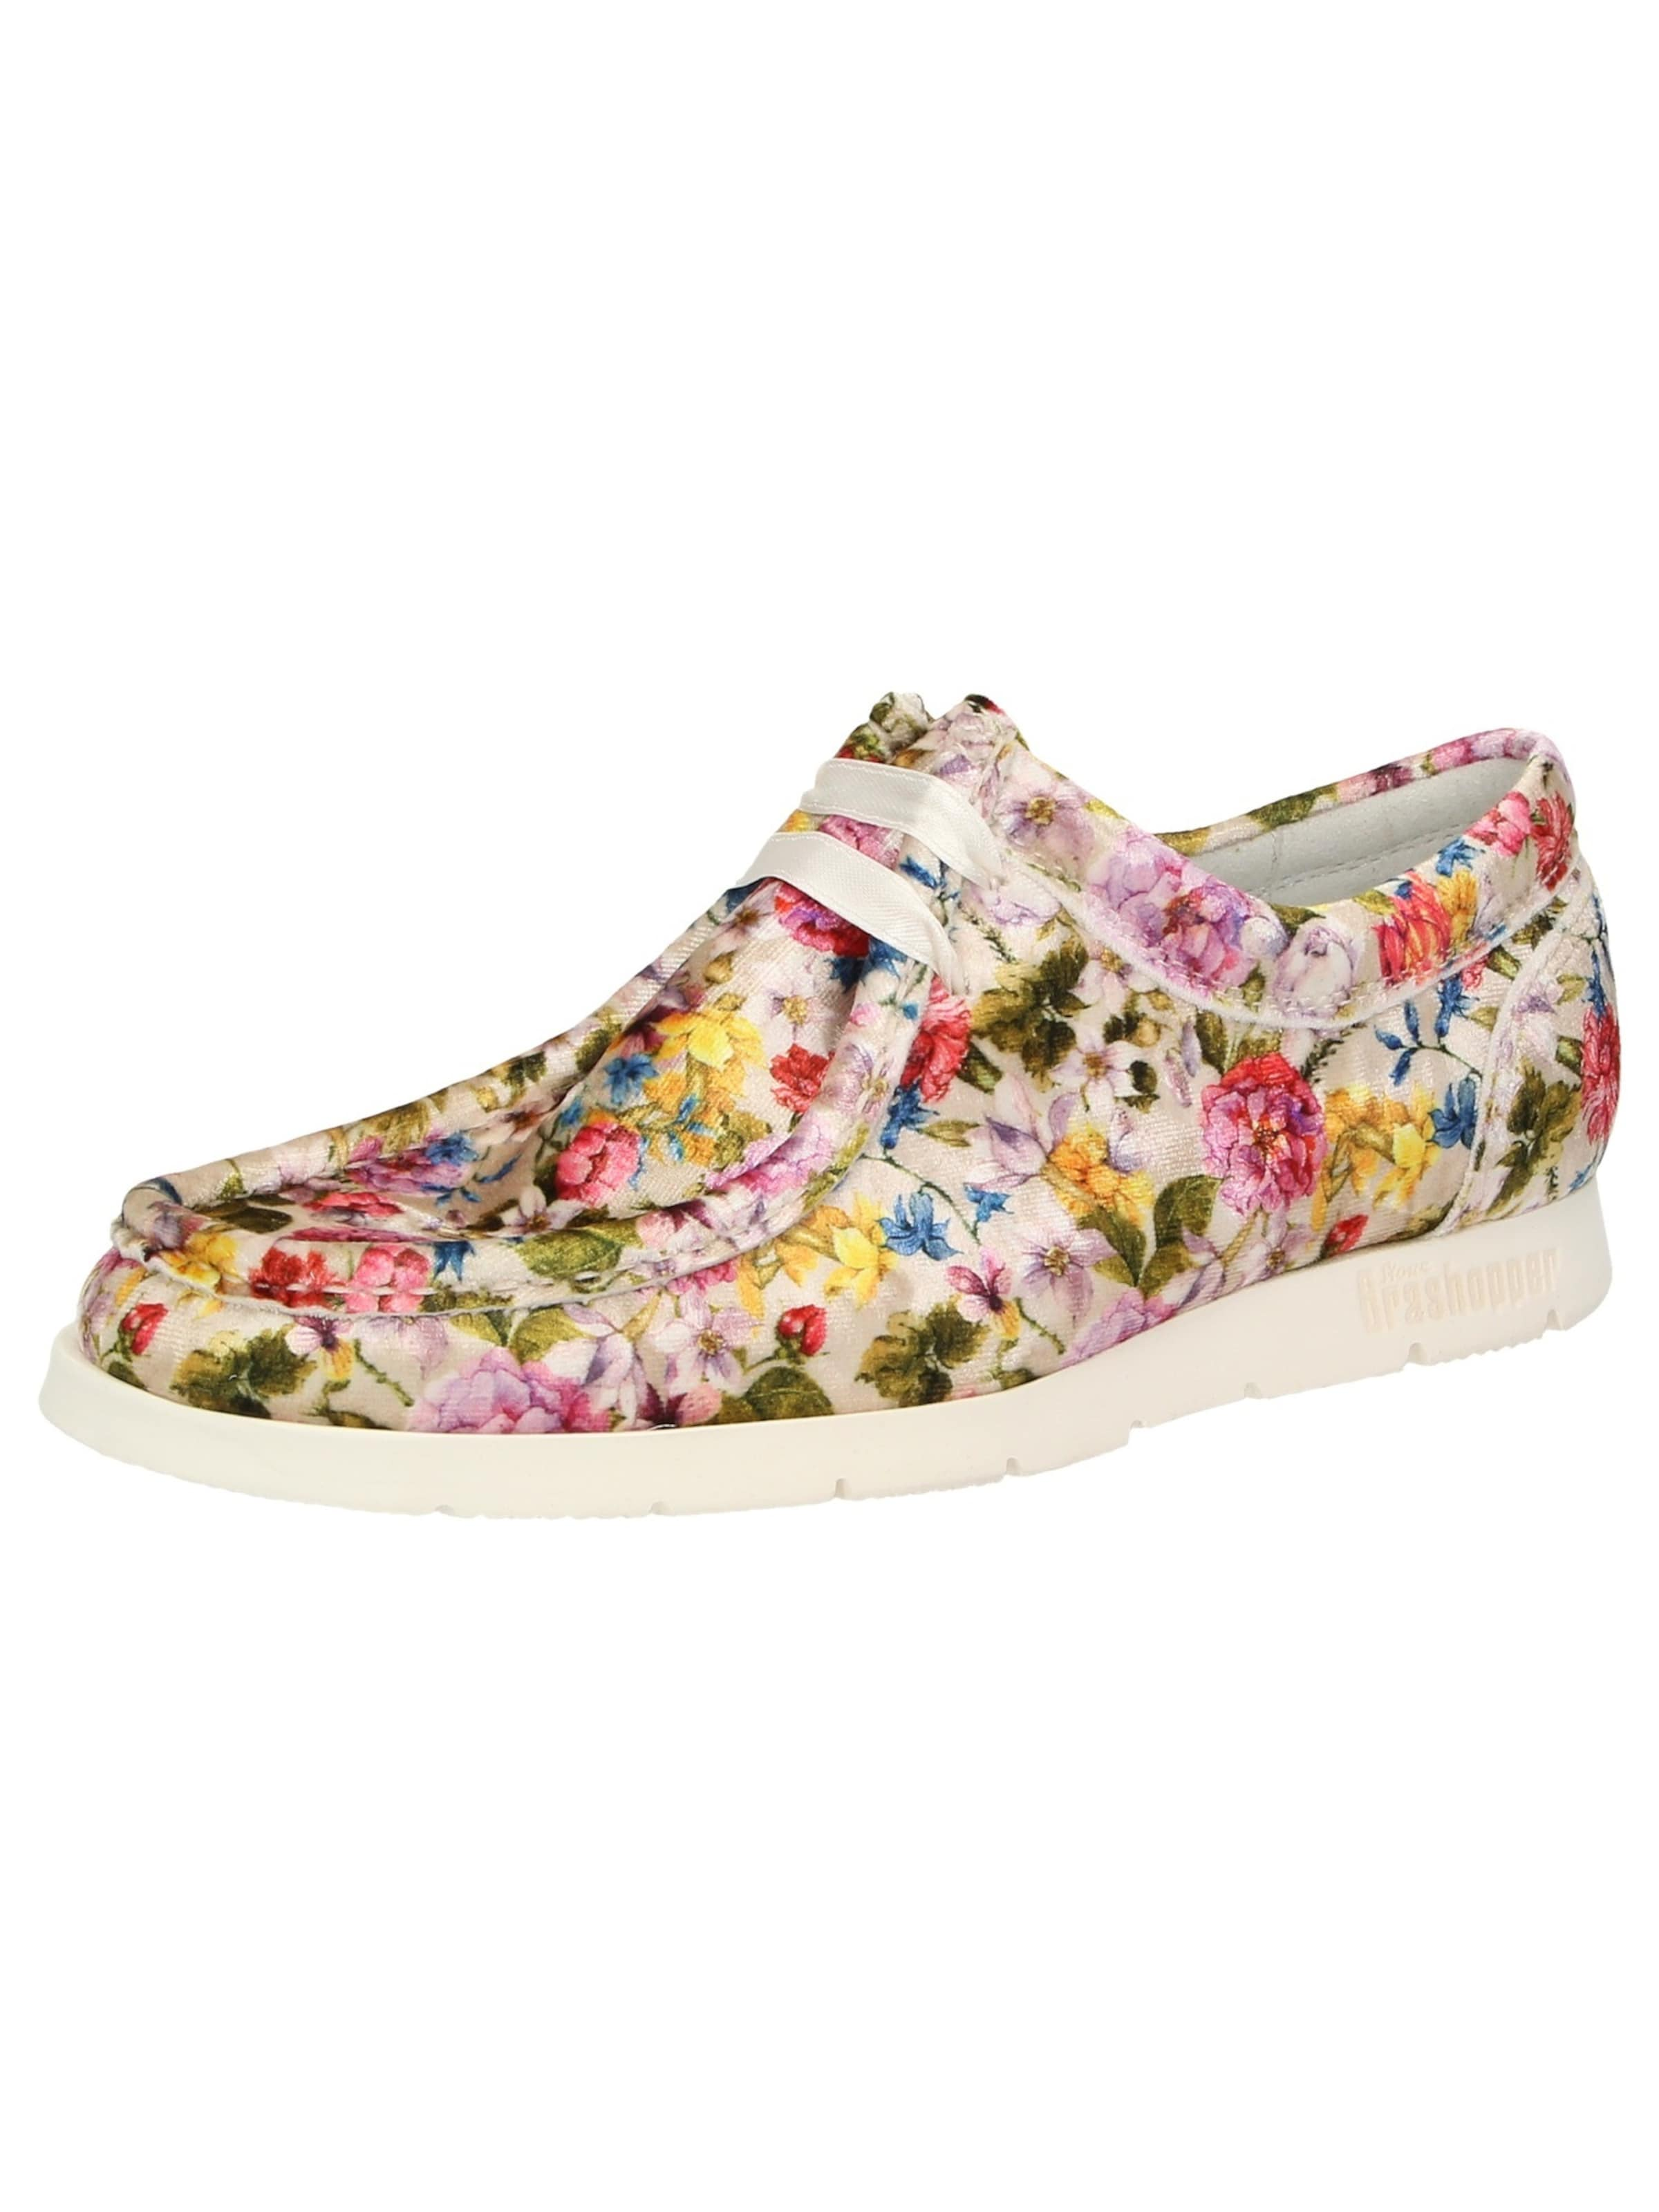 SIOUX Mokassin Grash.-D172-29 Verschleißfeste billige Schuhe